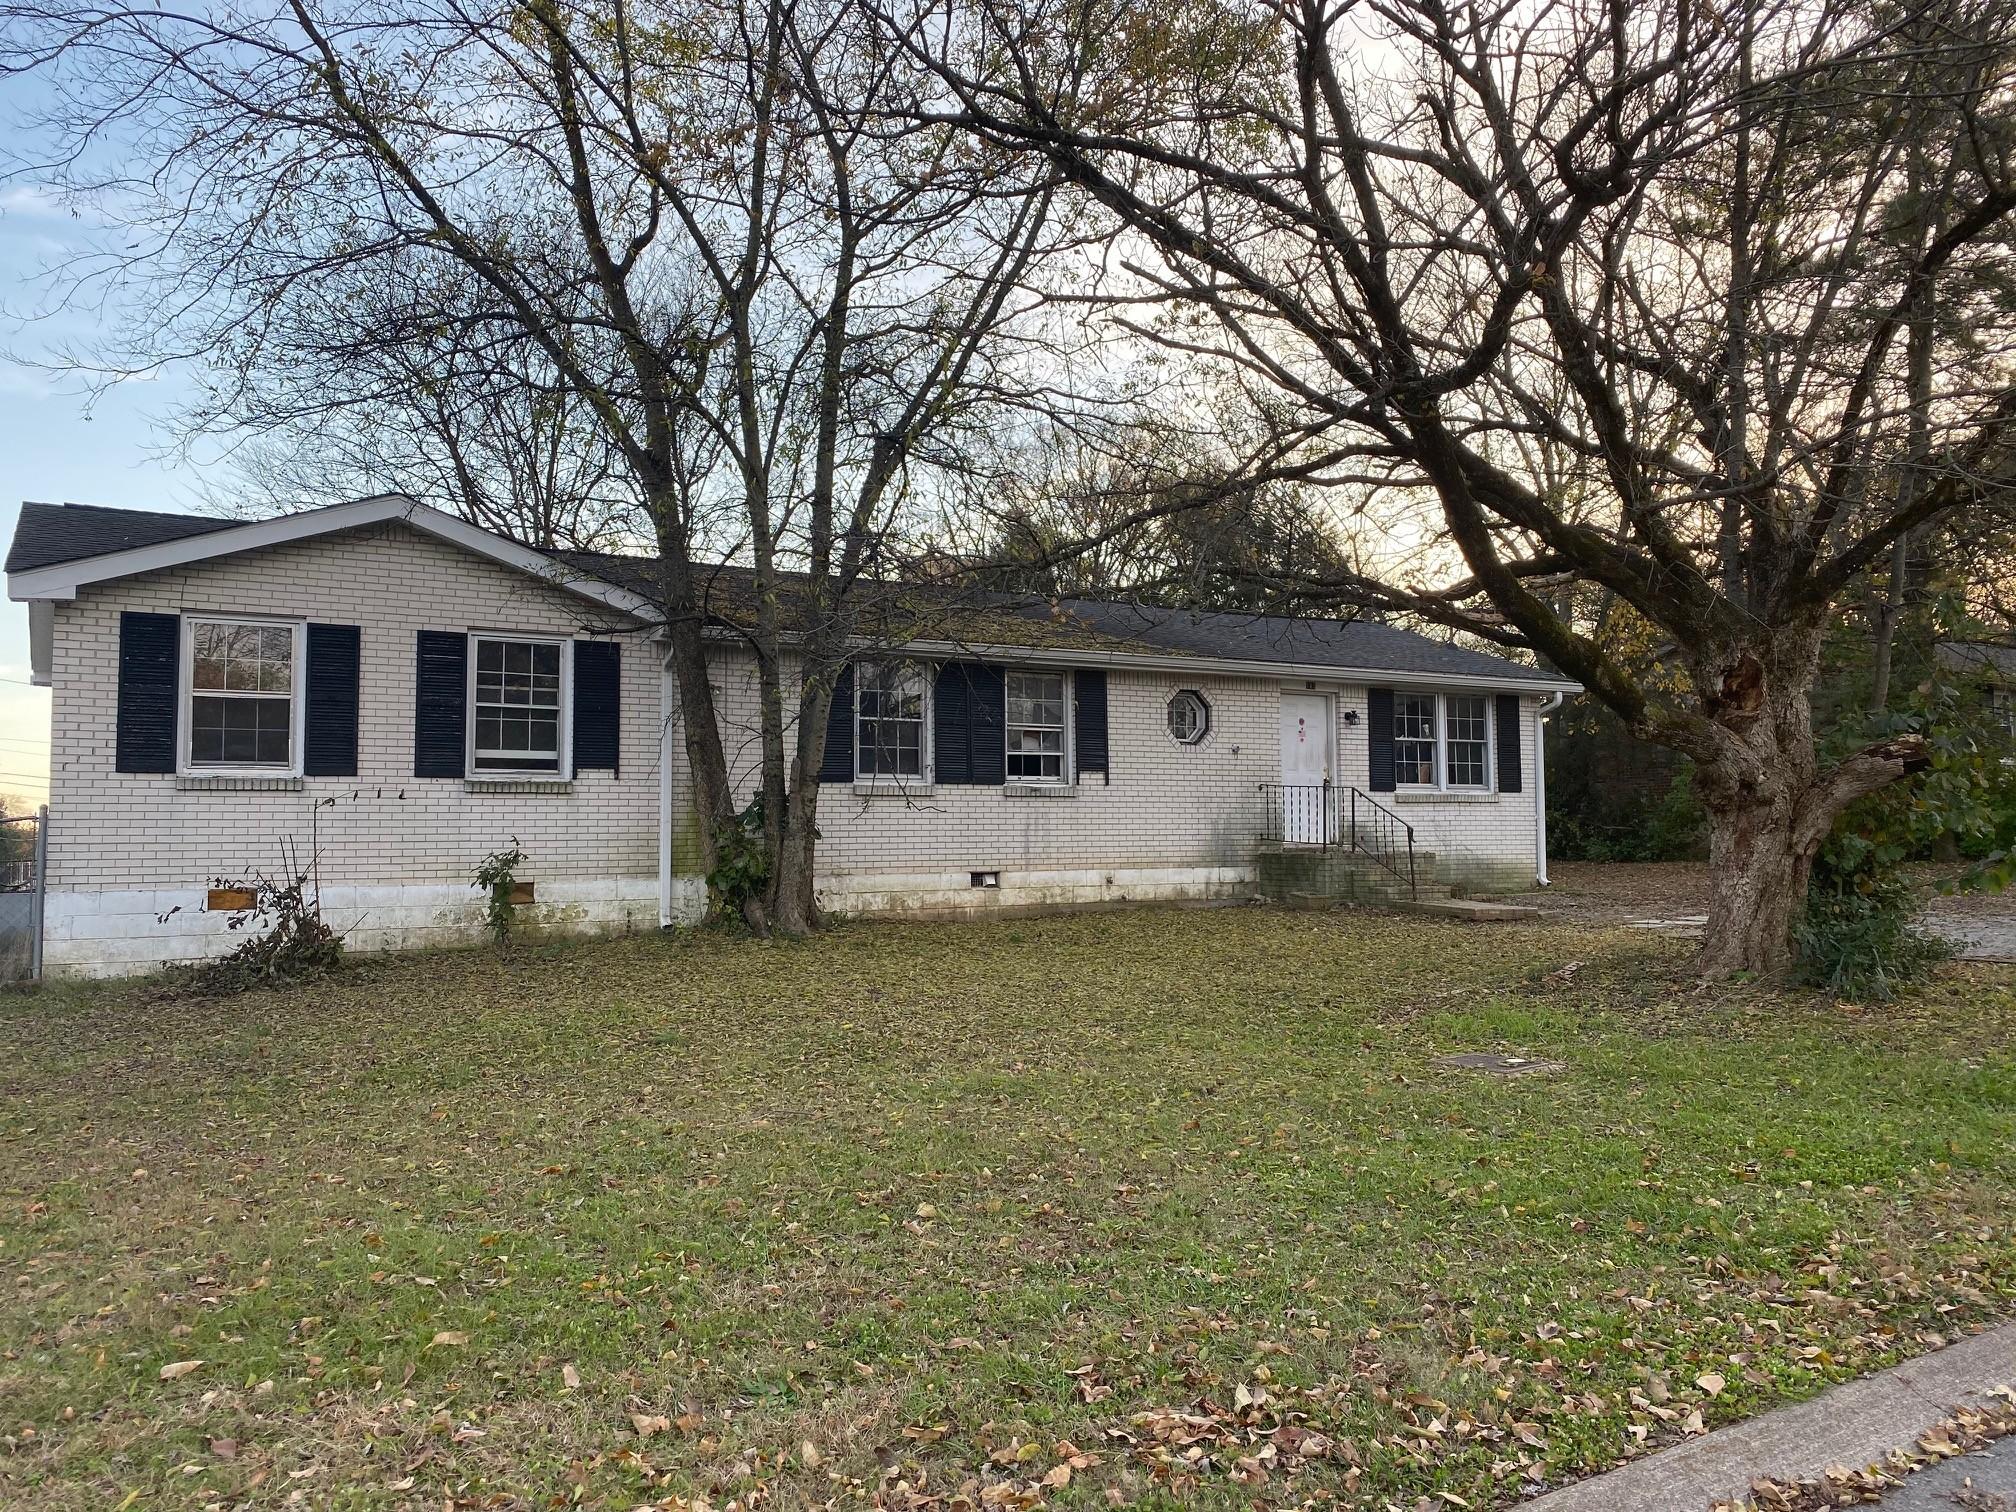 185 Becklea Dr, Madison, TN 37115 - Madison, TN real estate listing